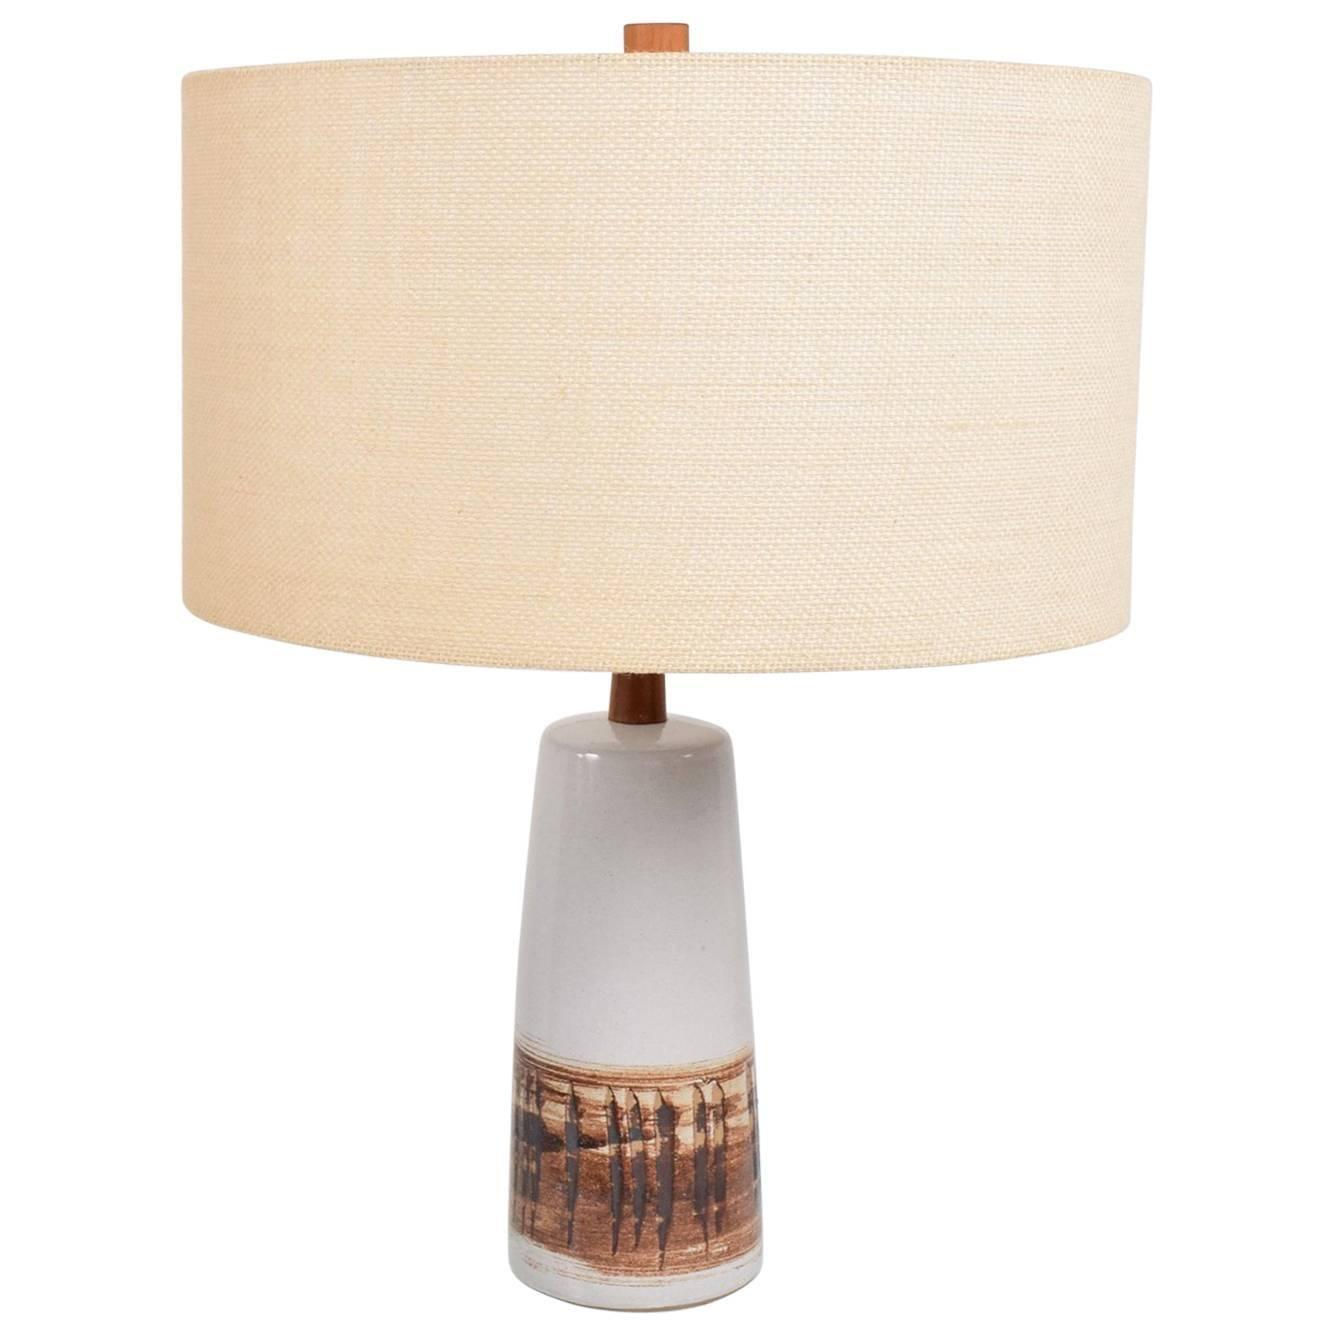 Mid-Century Modern Gordon Martz Ceramic Table Lamp